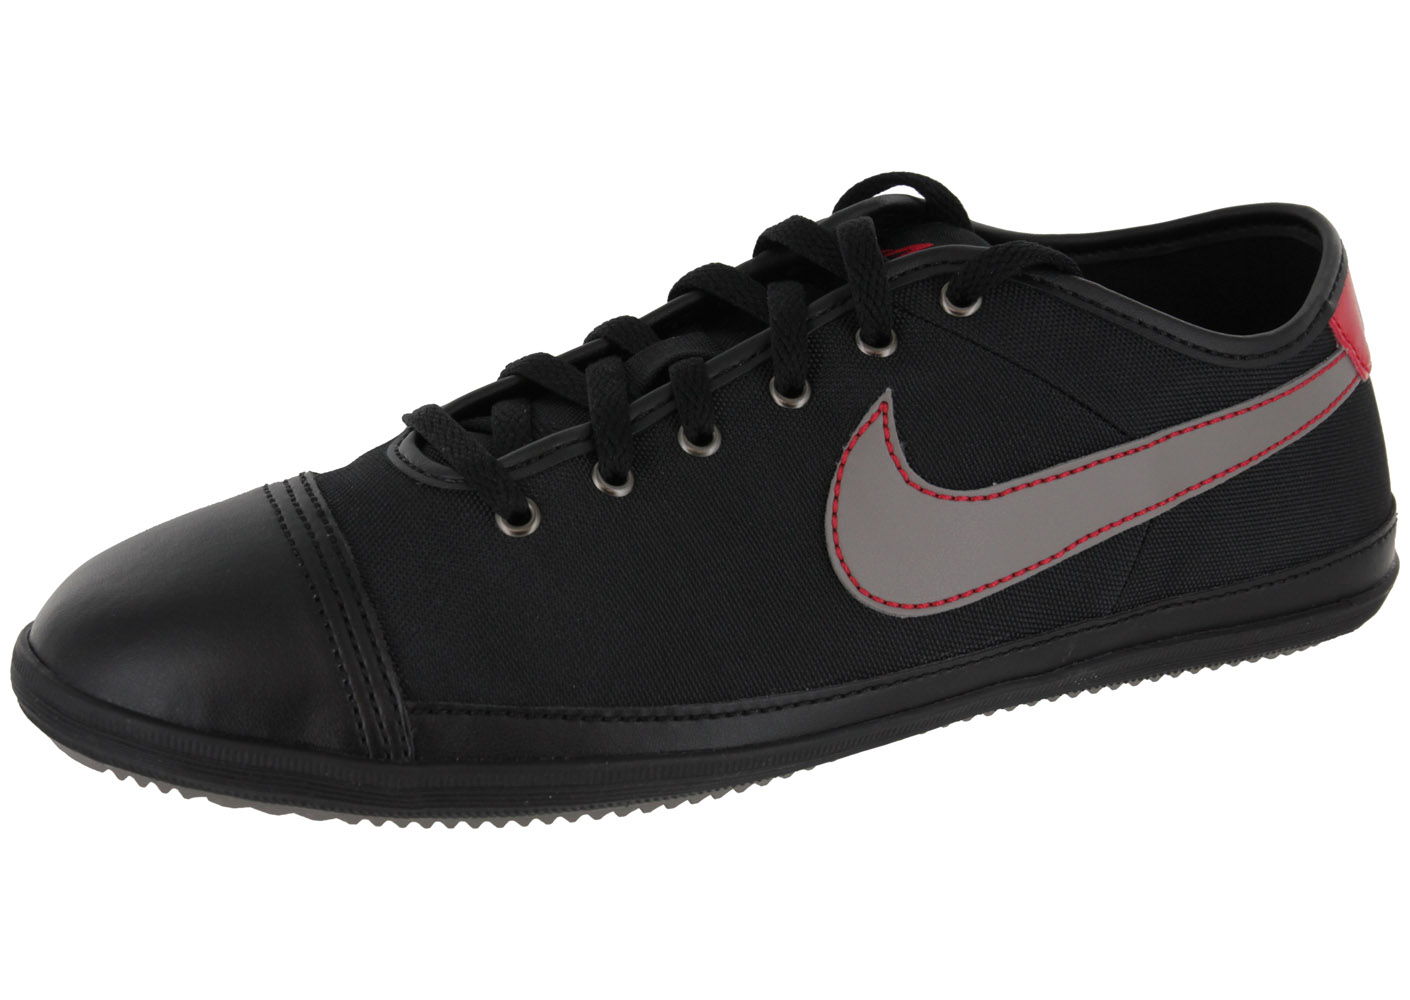 Nike Sportswear Basses Flash Noir Baskets 7qaPOwn7x